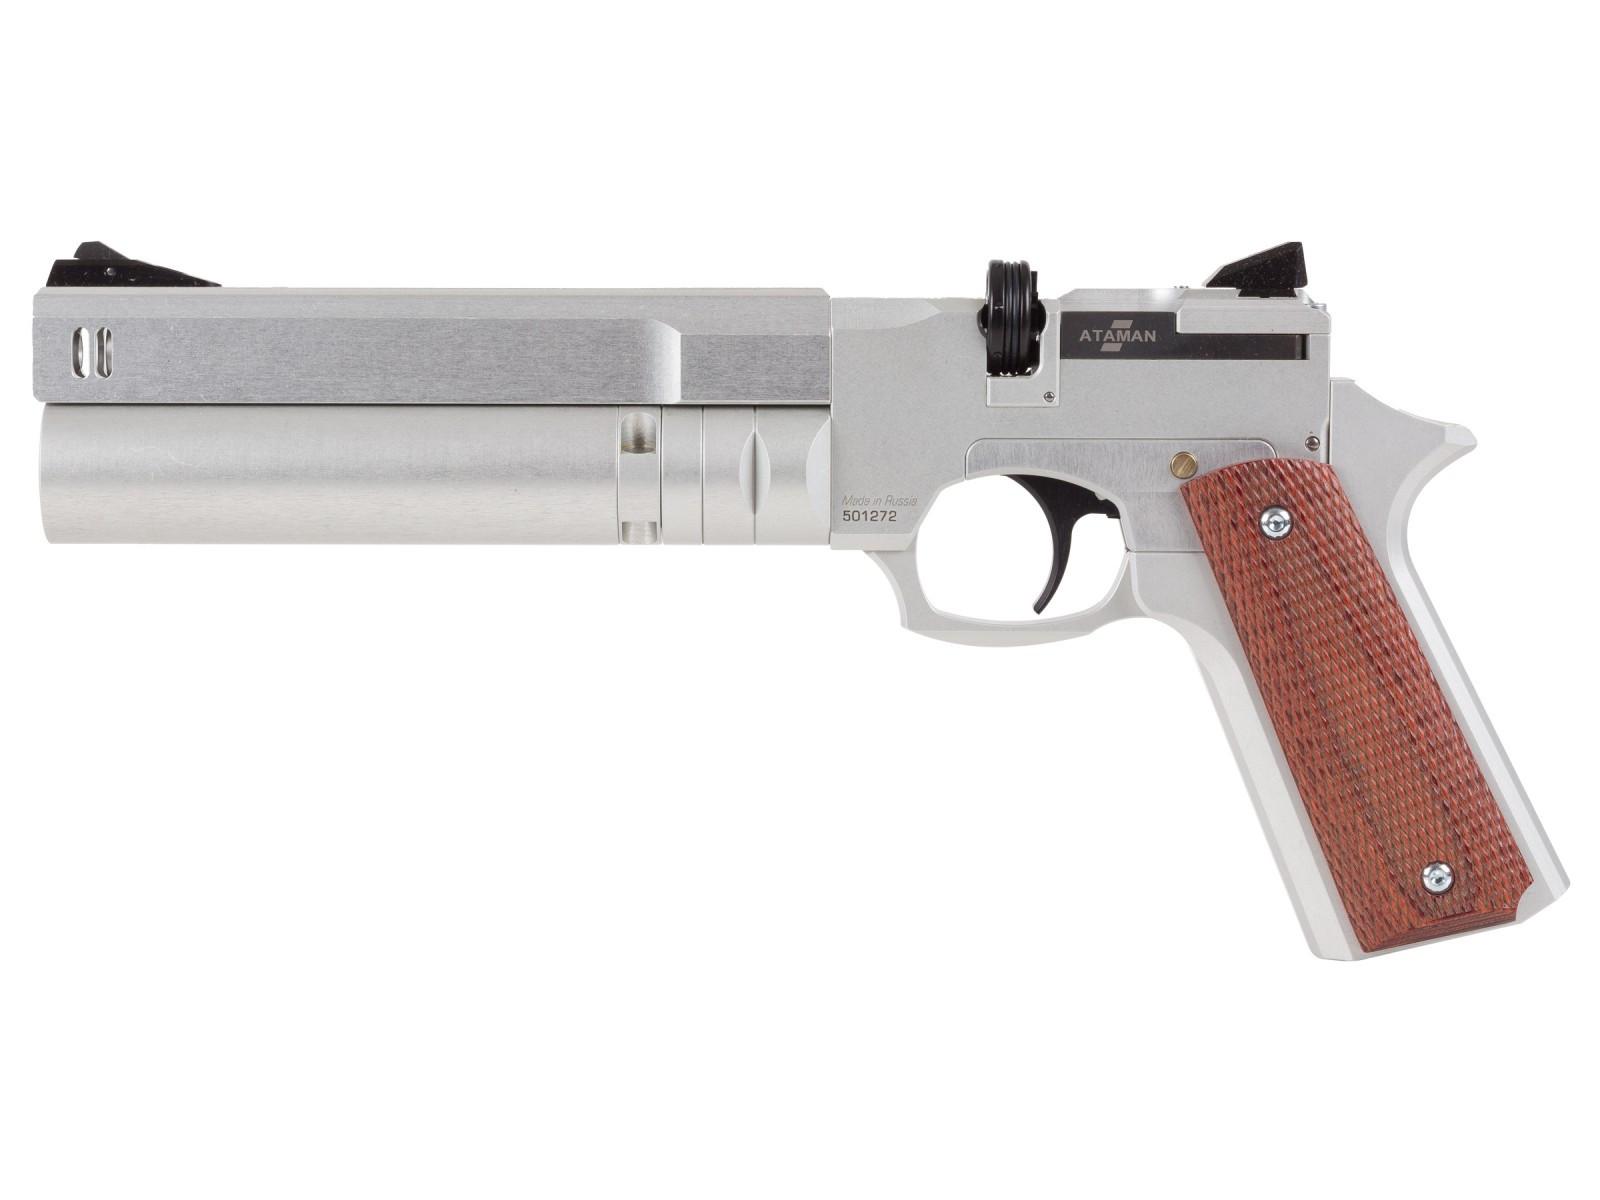 Ataman AP16 Regulated Compact Air Pistol, Silver 0.22